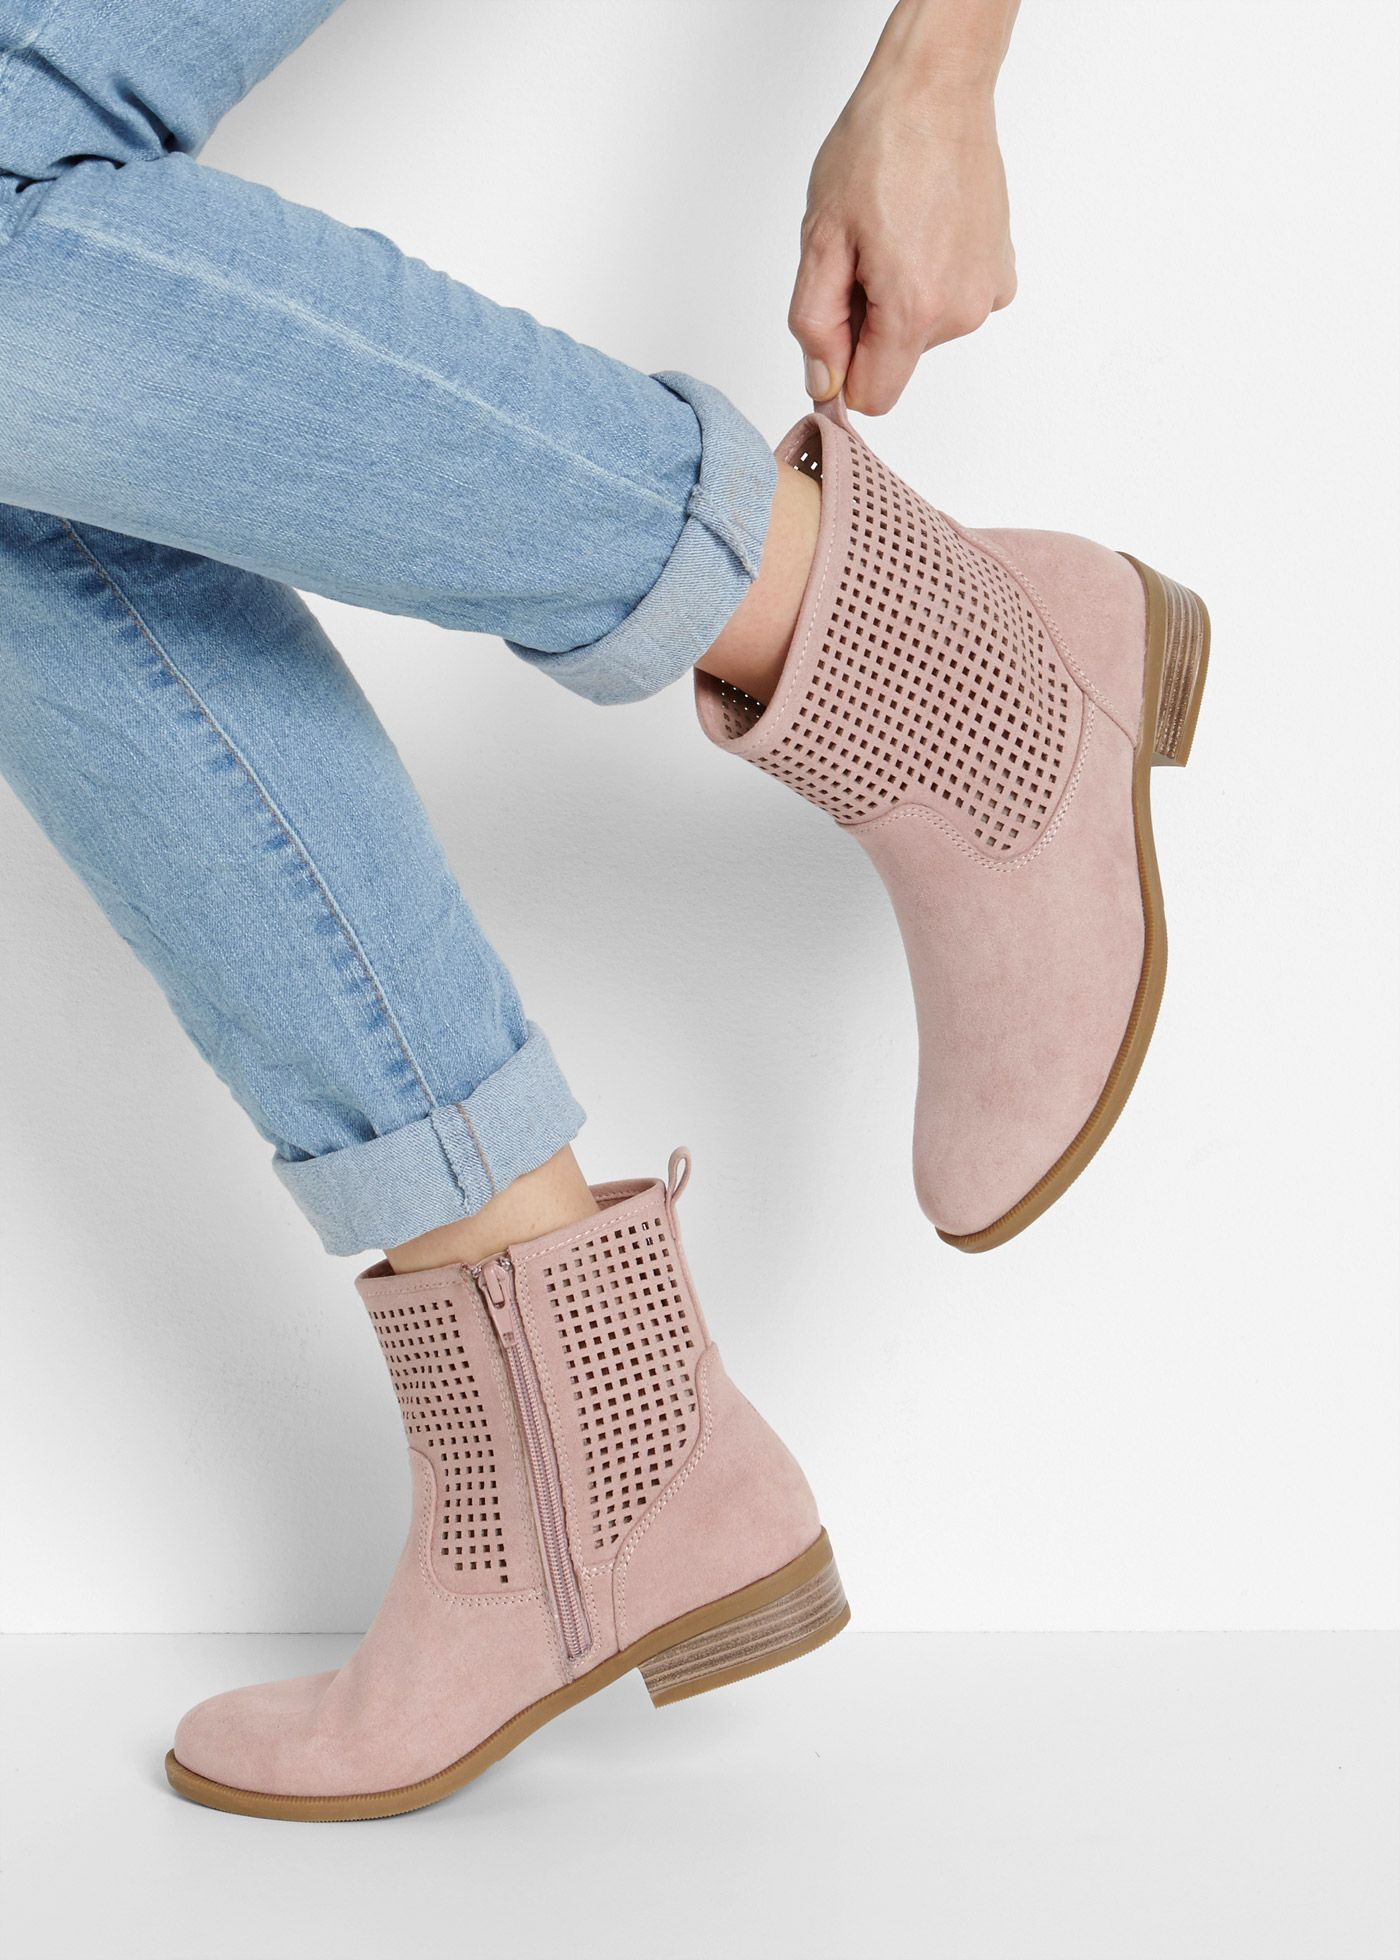 Stiefelette Stiefeletten Stiefeletten Altrosa Und Schuhe